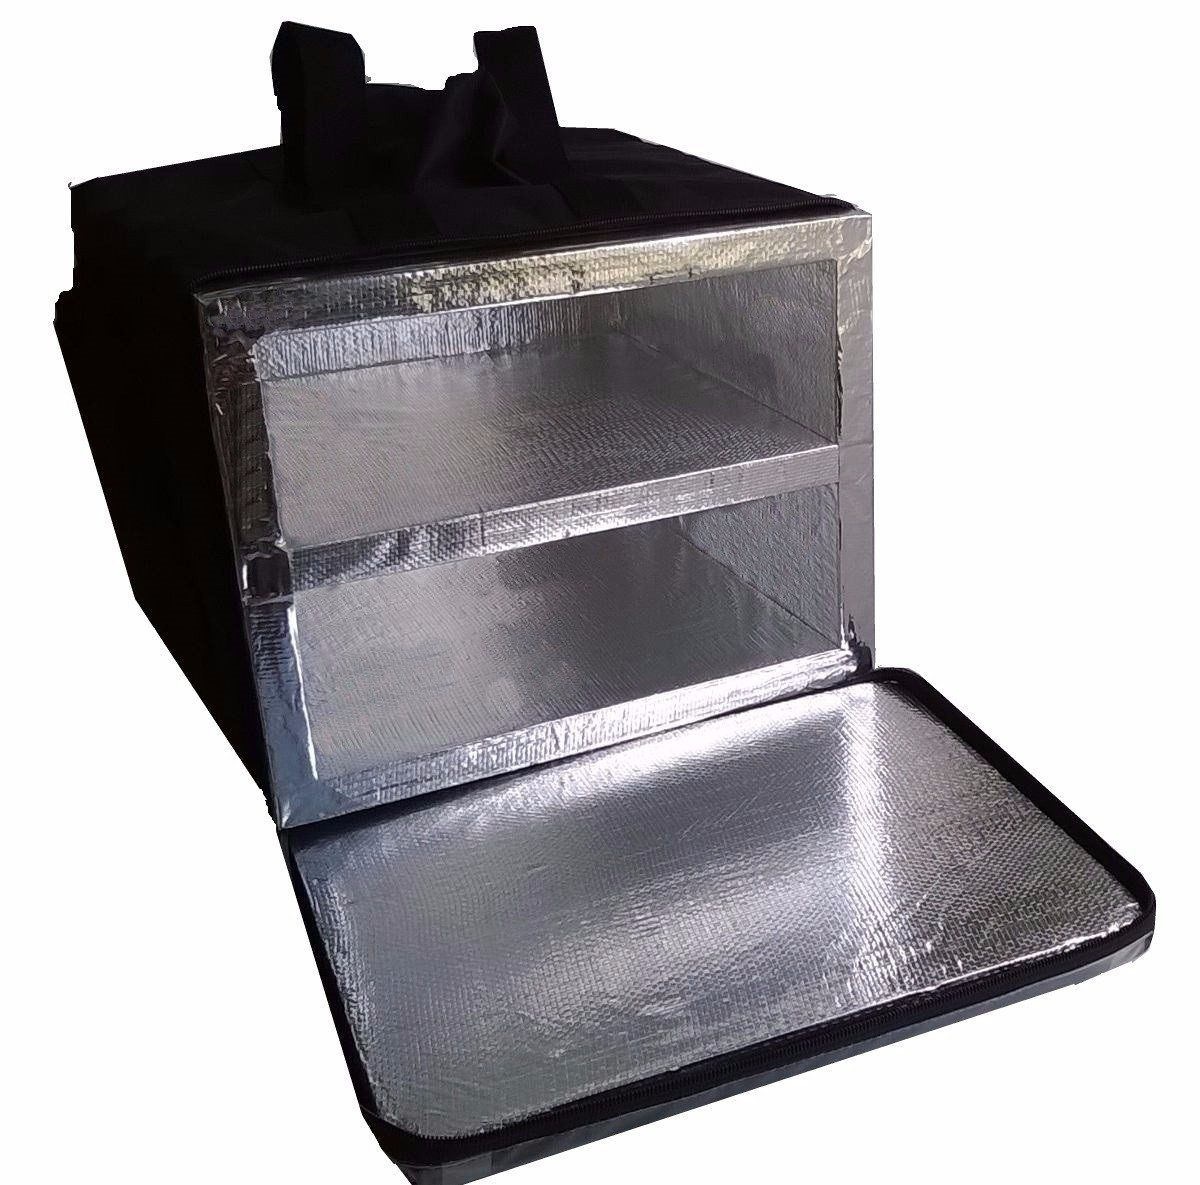 Bolsa Mochila Pizza Lanches 2 Divisórias Alumínio 50cm Bpal  - GuerreiroOnline